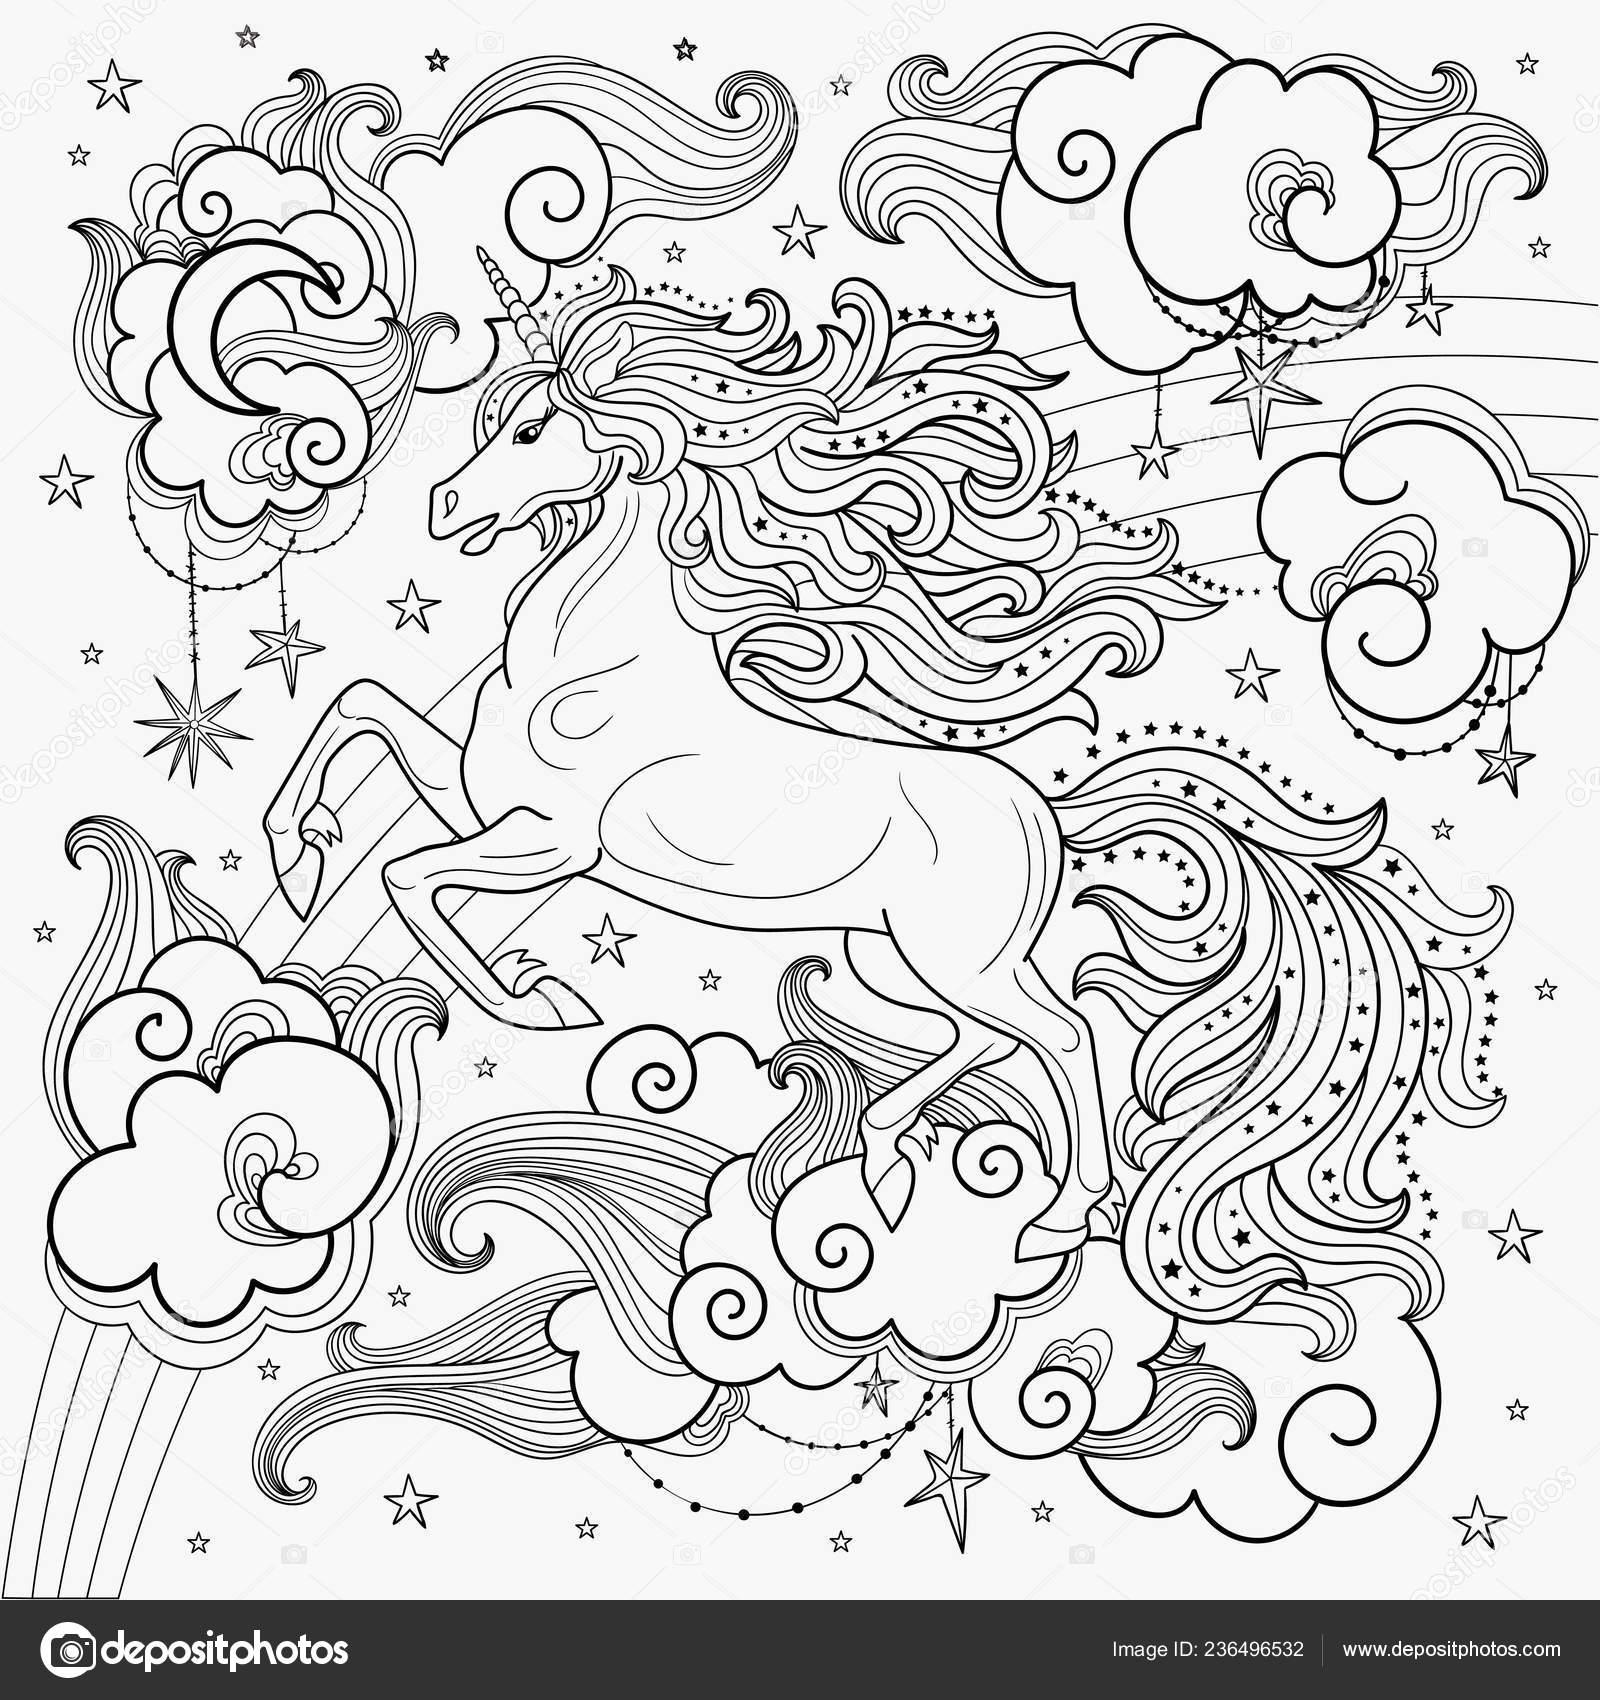 Hermoso Unicornio Entre Las Nubes Dibujado Mano Blanco Negro Para